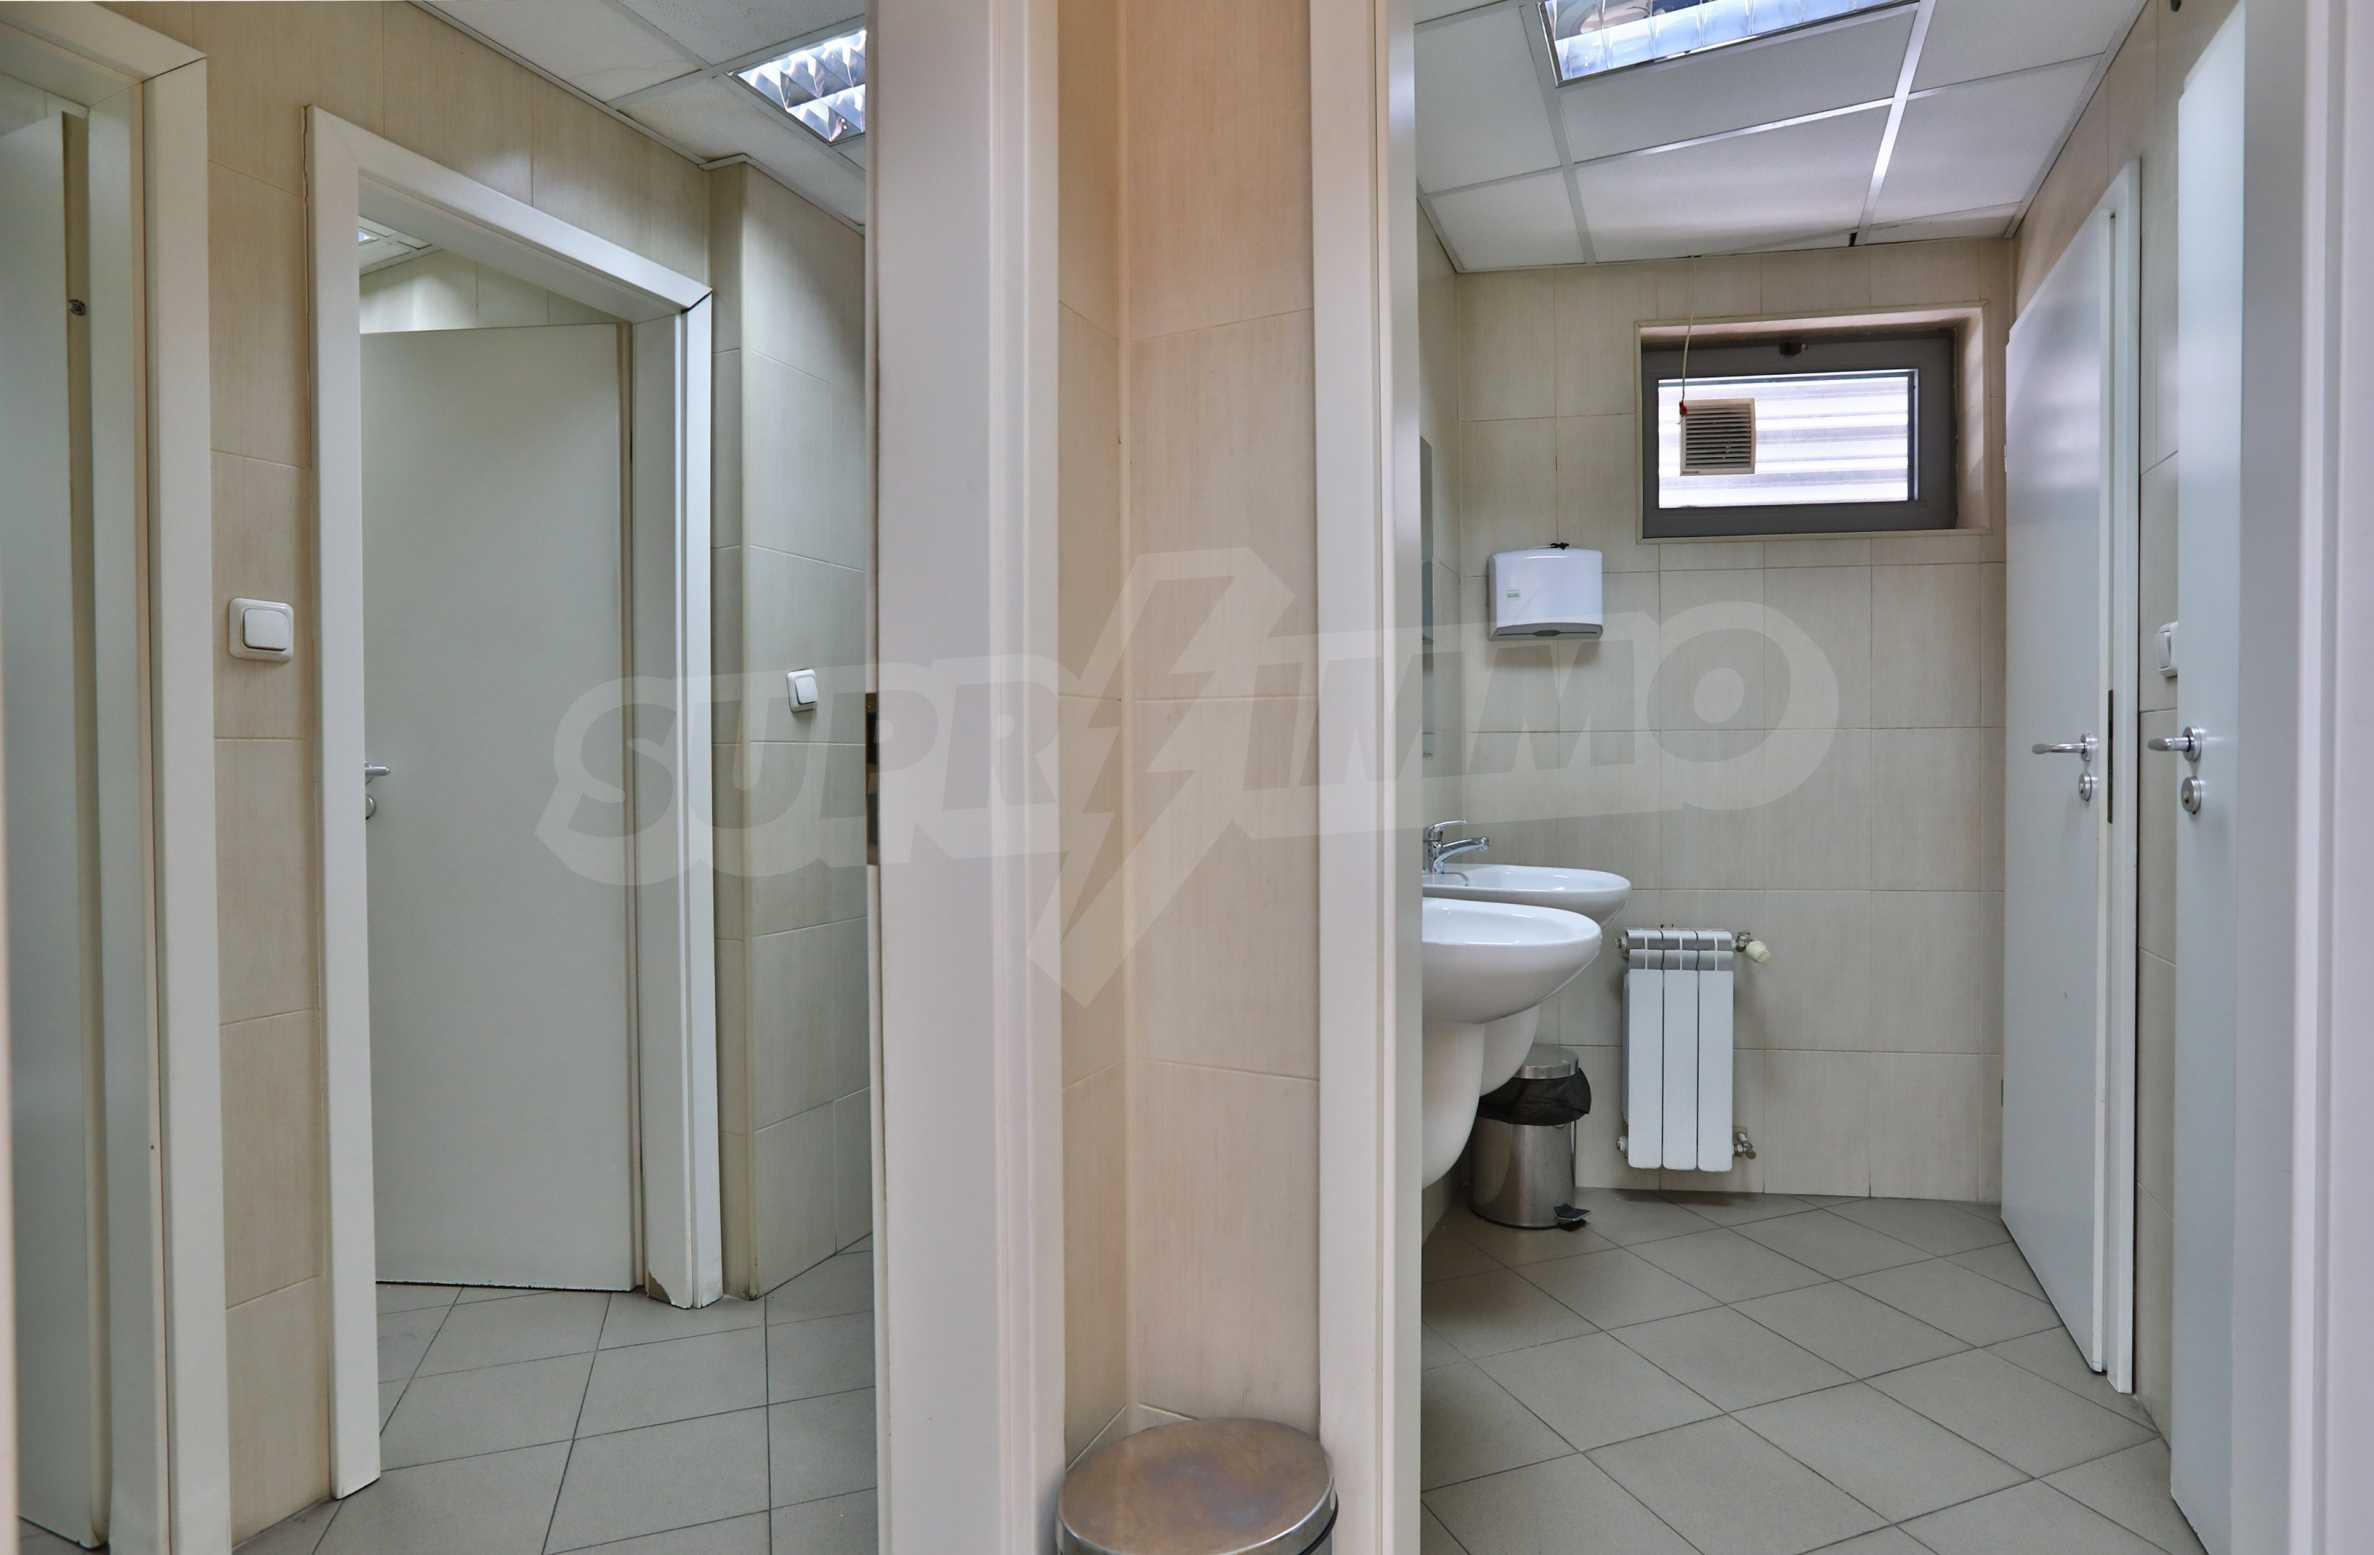 Офис в бизнес сграда висок клас на бул. Цариградско шосе 28